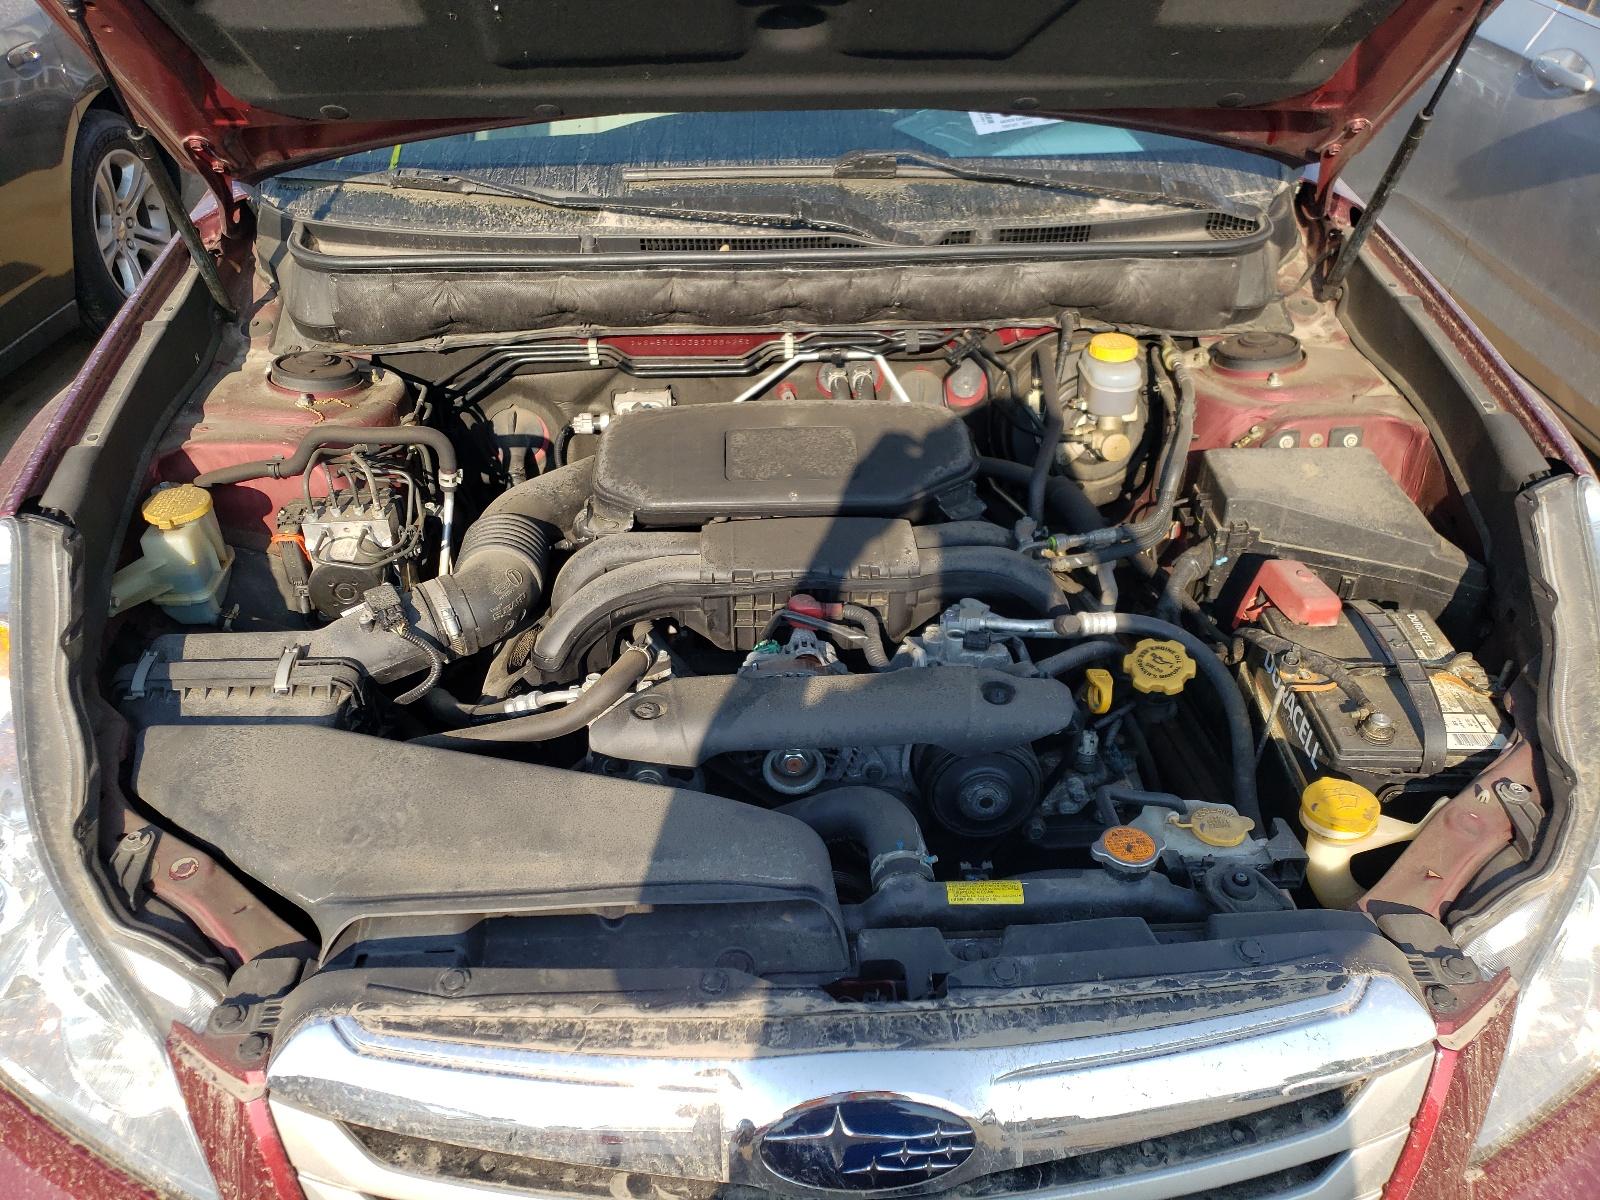 Subaru Outback 2 2011 VIN 4S4BRCLC3B3388425